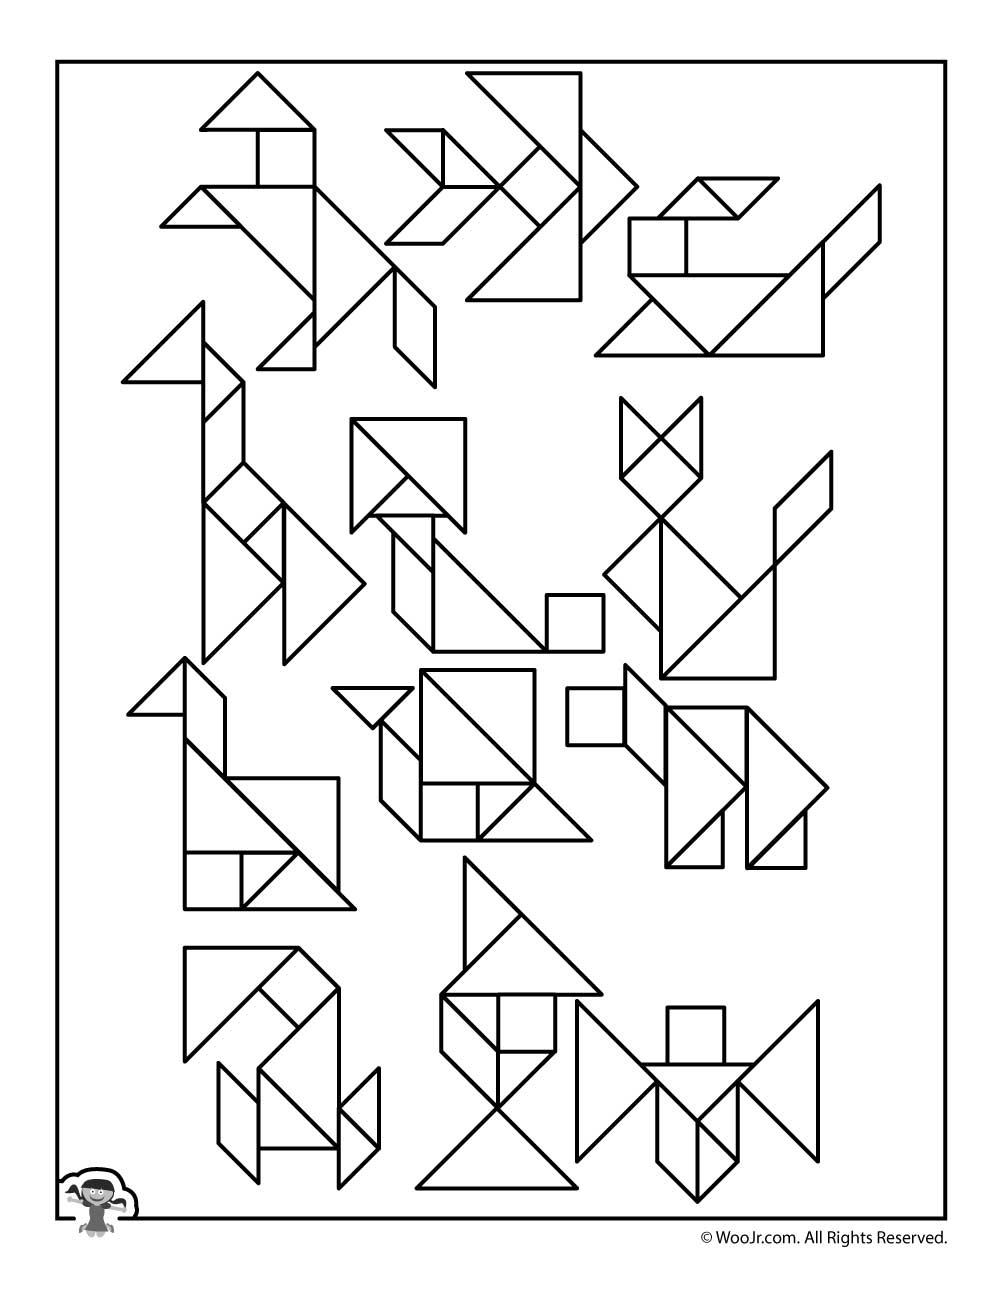 Printable Tangram Puzzles Answer Key | Woo! Jr. Kids Activities - Printable Tangram Puzzles And Solutions